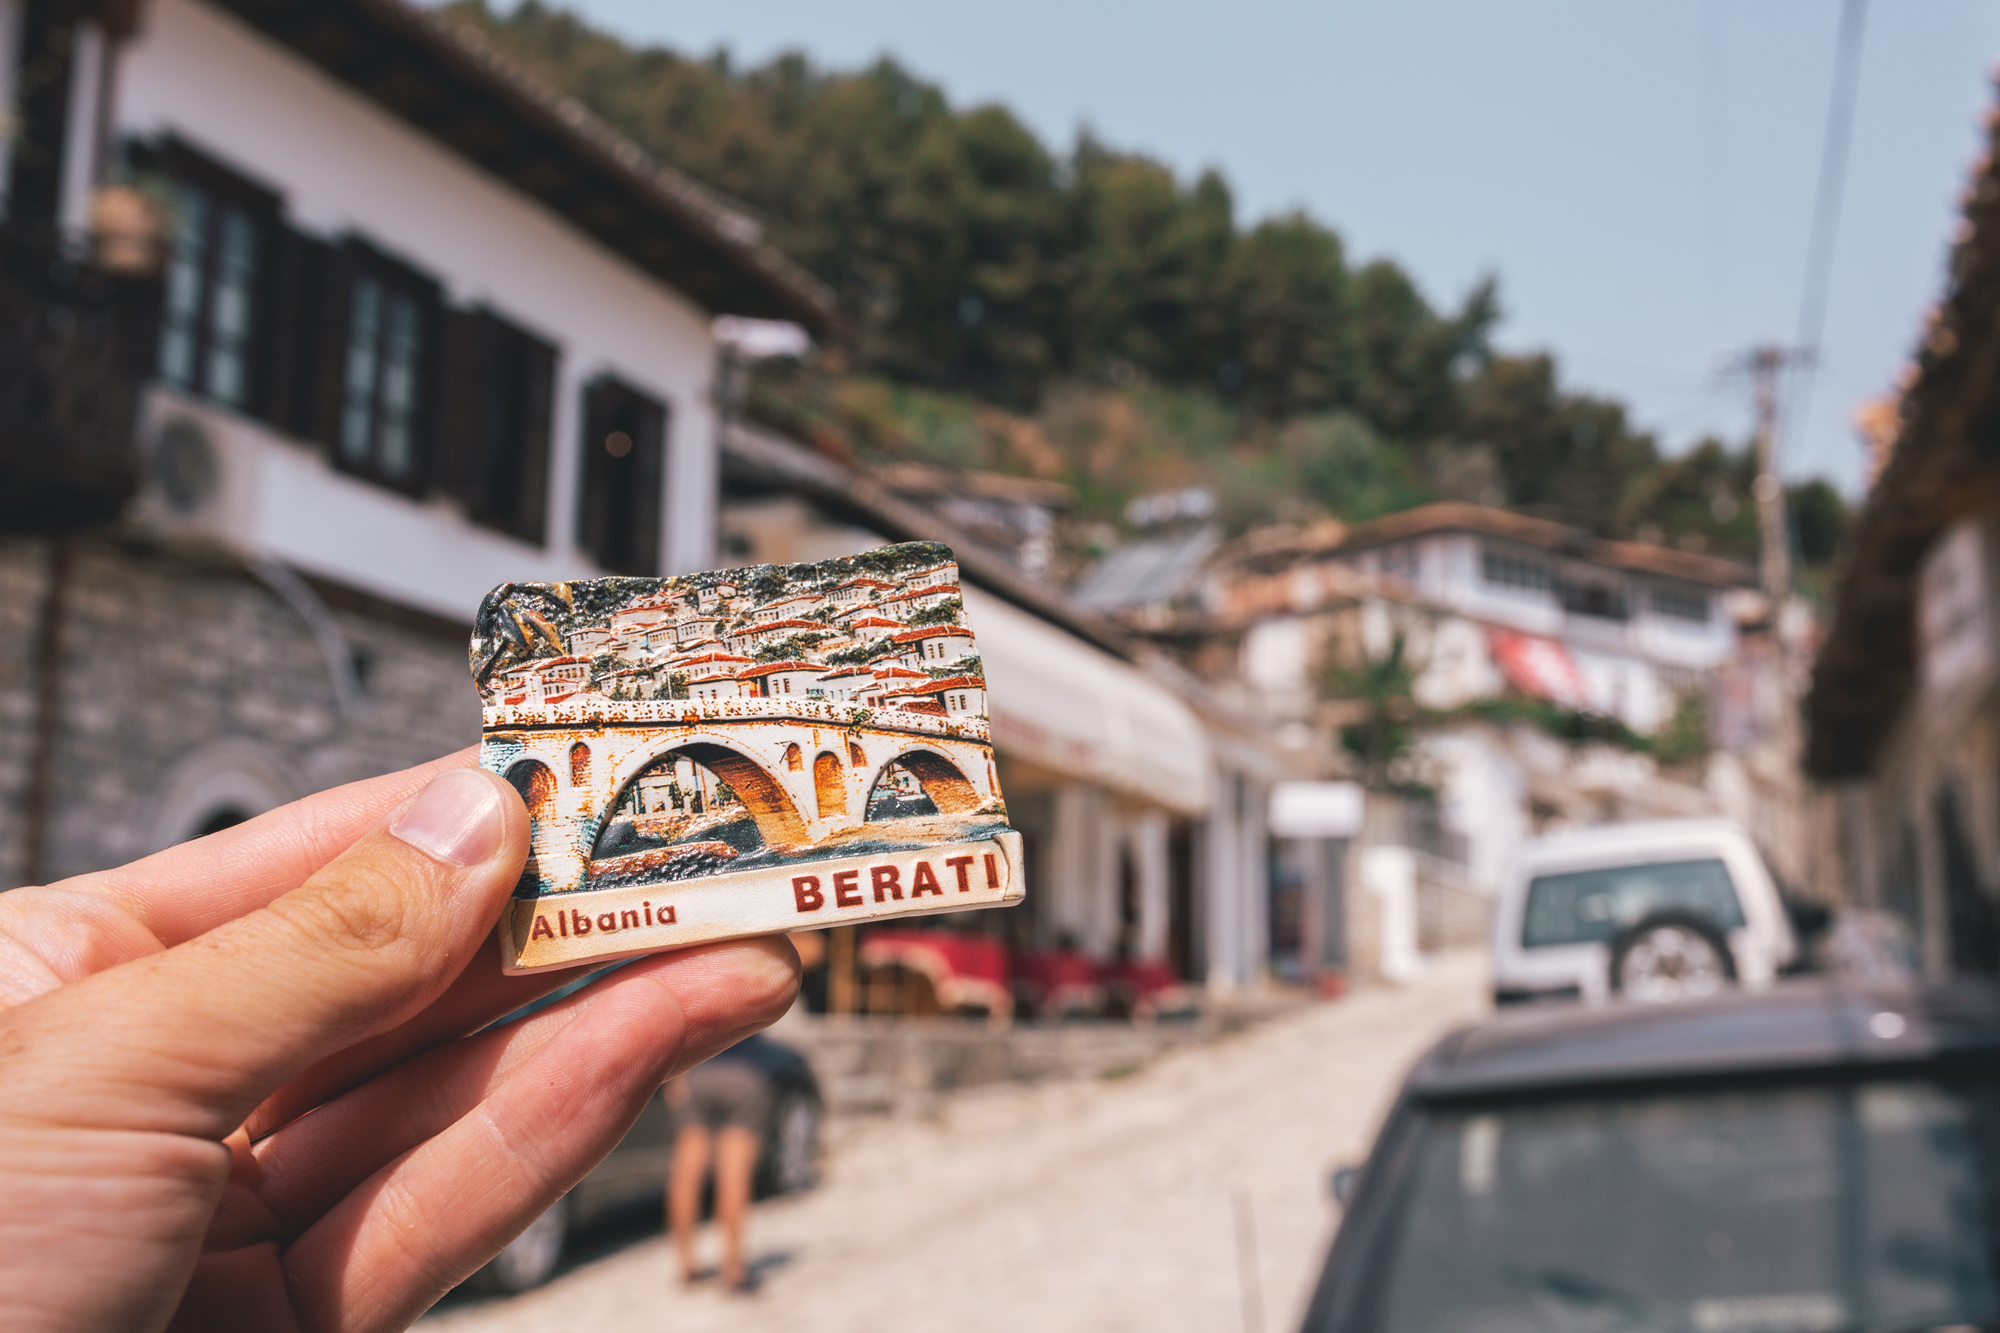 A girl holding a souvenir in Berati, Albania.